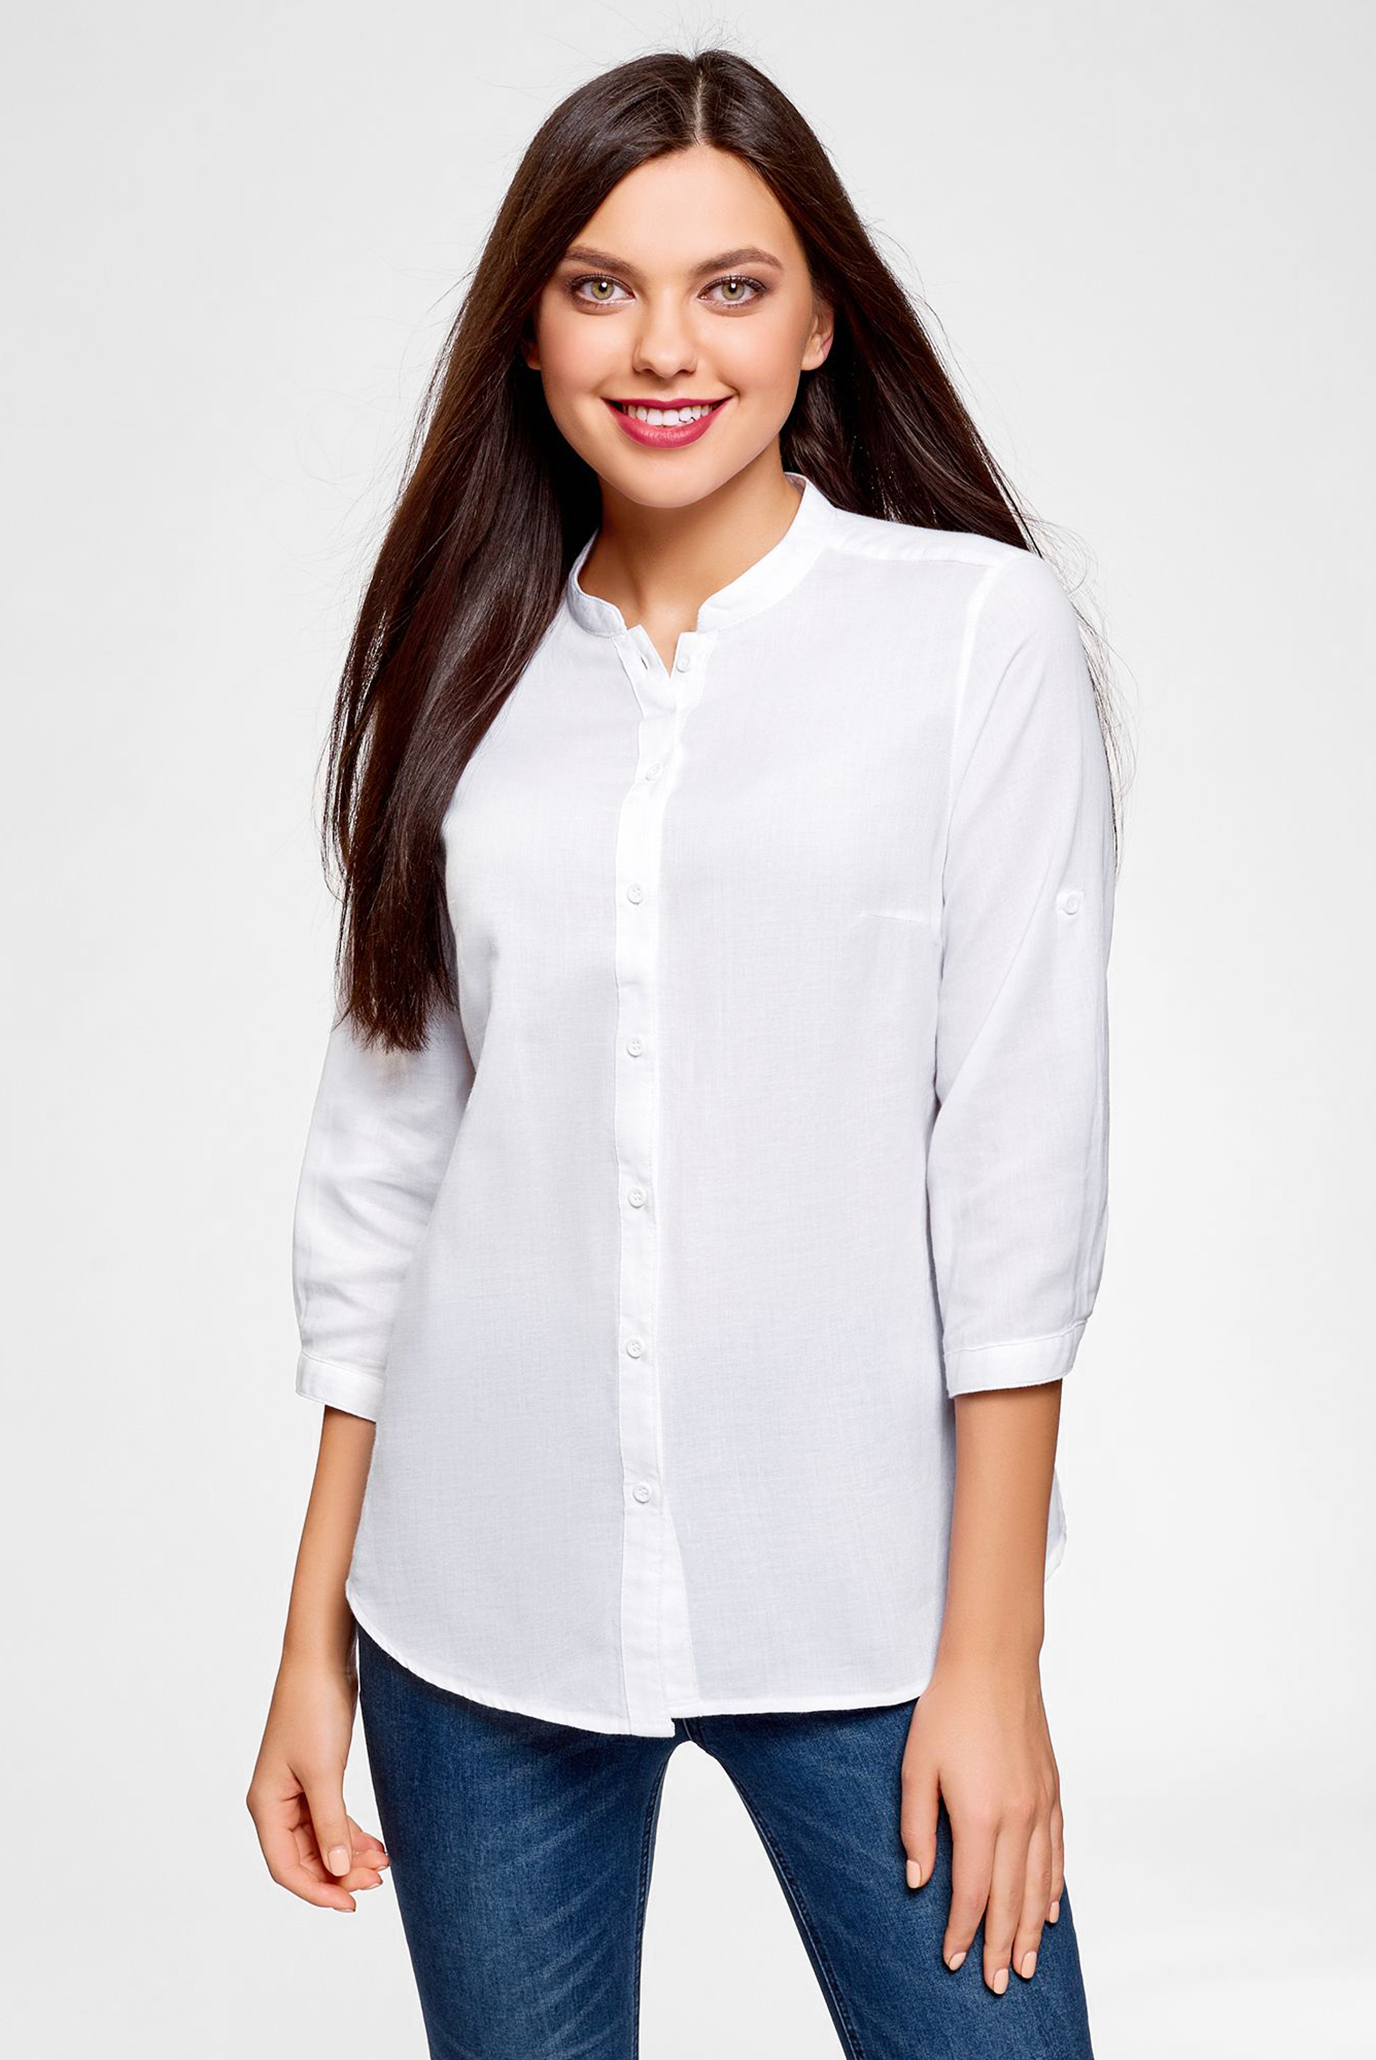 8b6d56e625b04b0 Купить Женская белая рубашка Oodji Oodji 23L12001B/45608/1000N – Киев,  Украина. Цены в интернет магазине MD Fashion